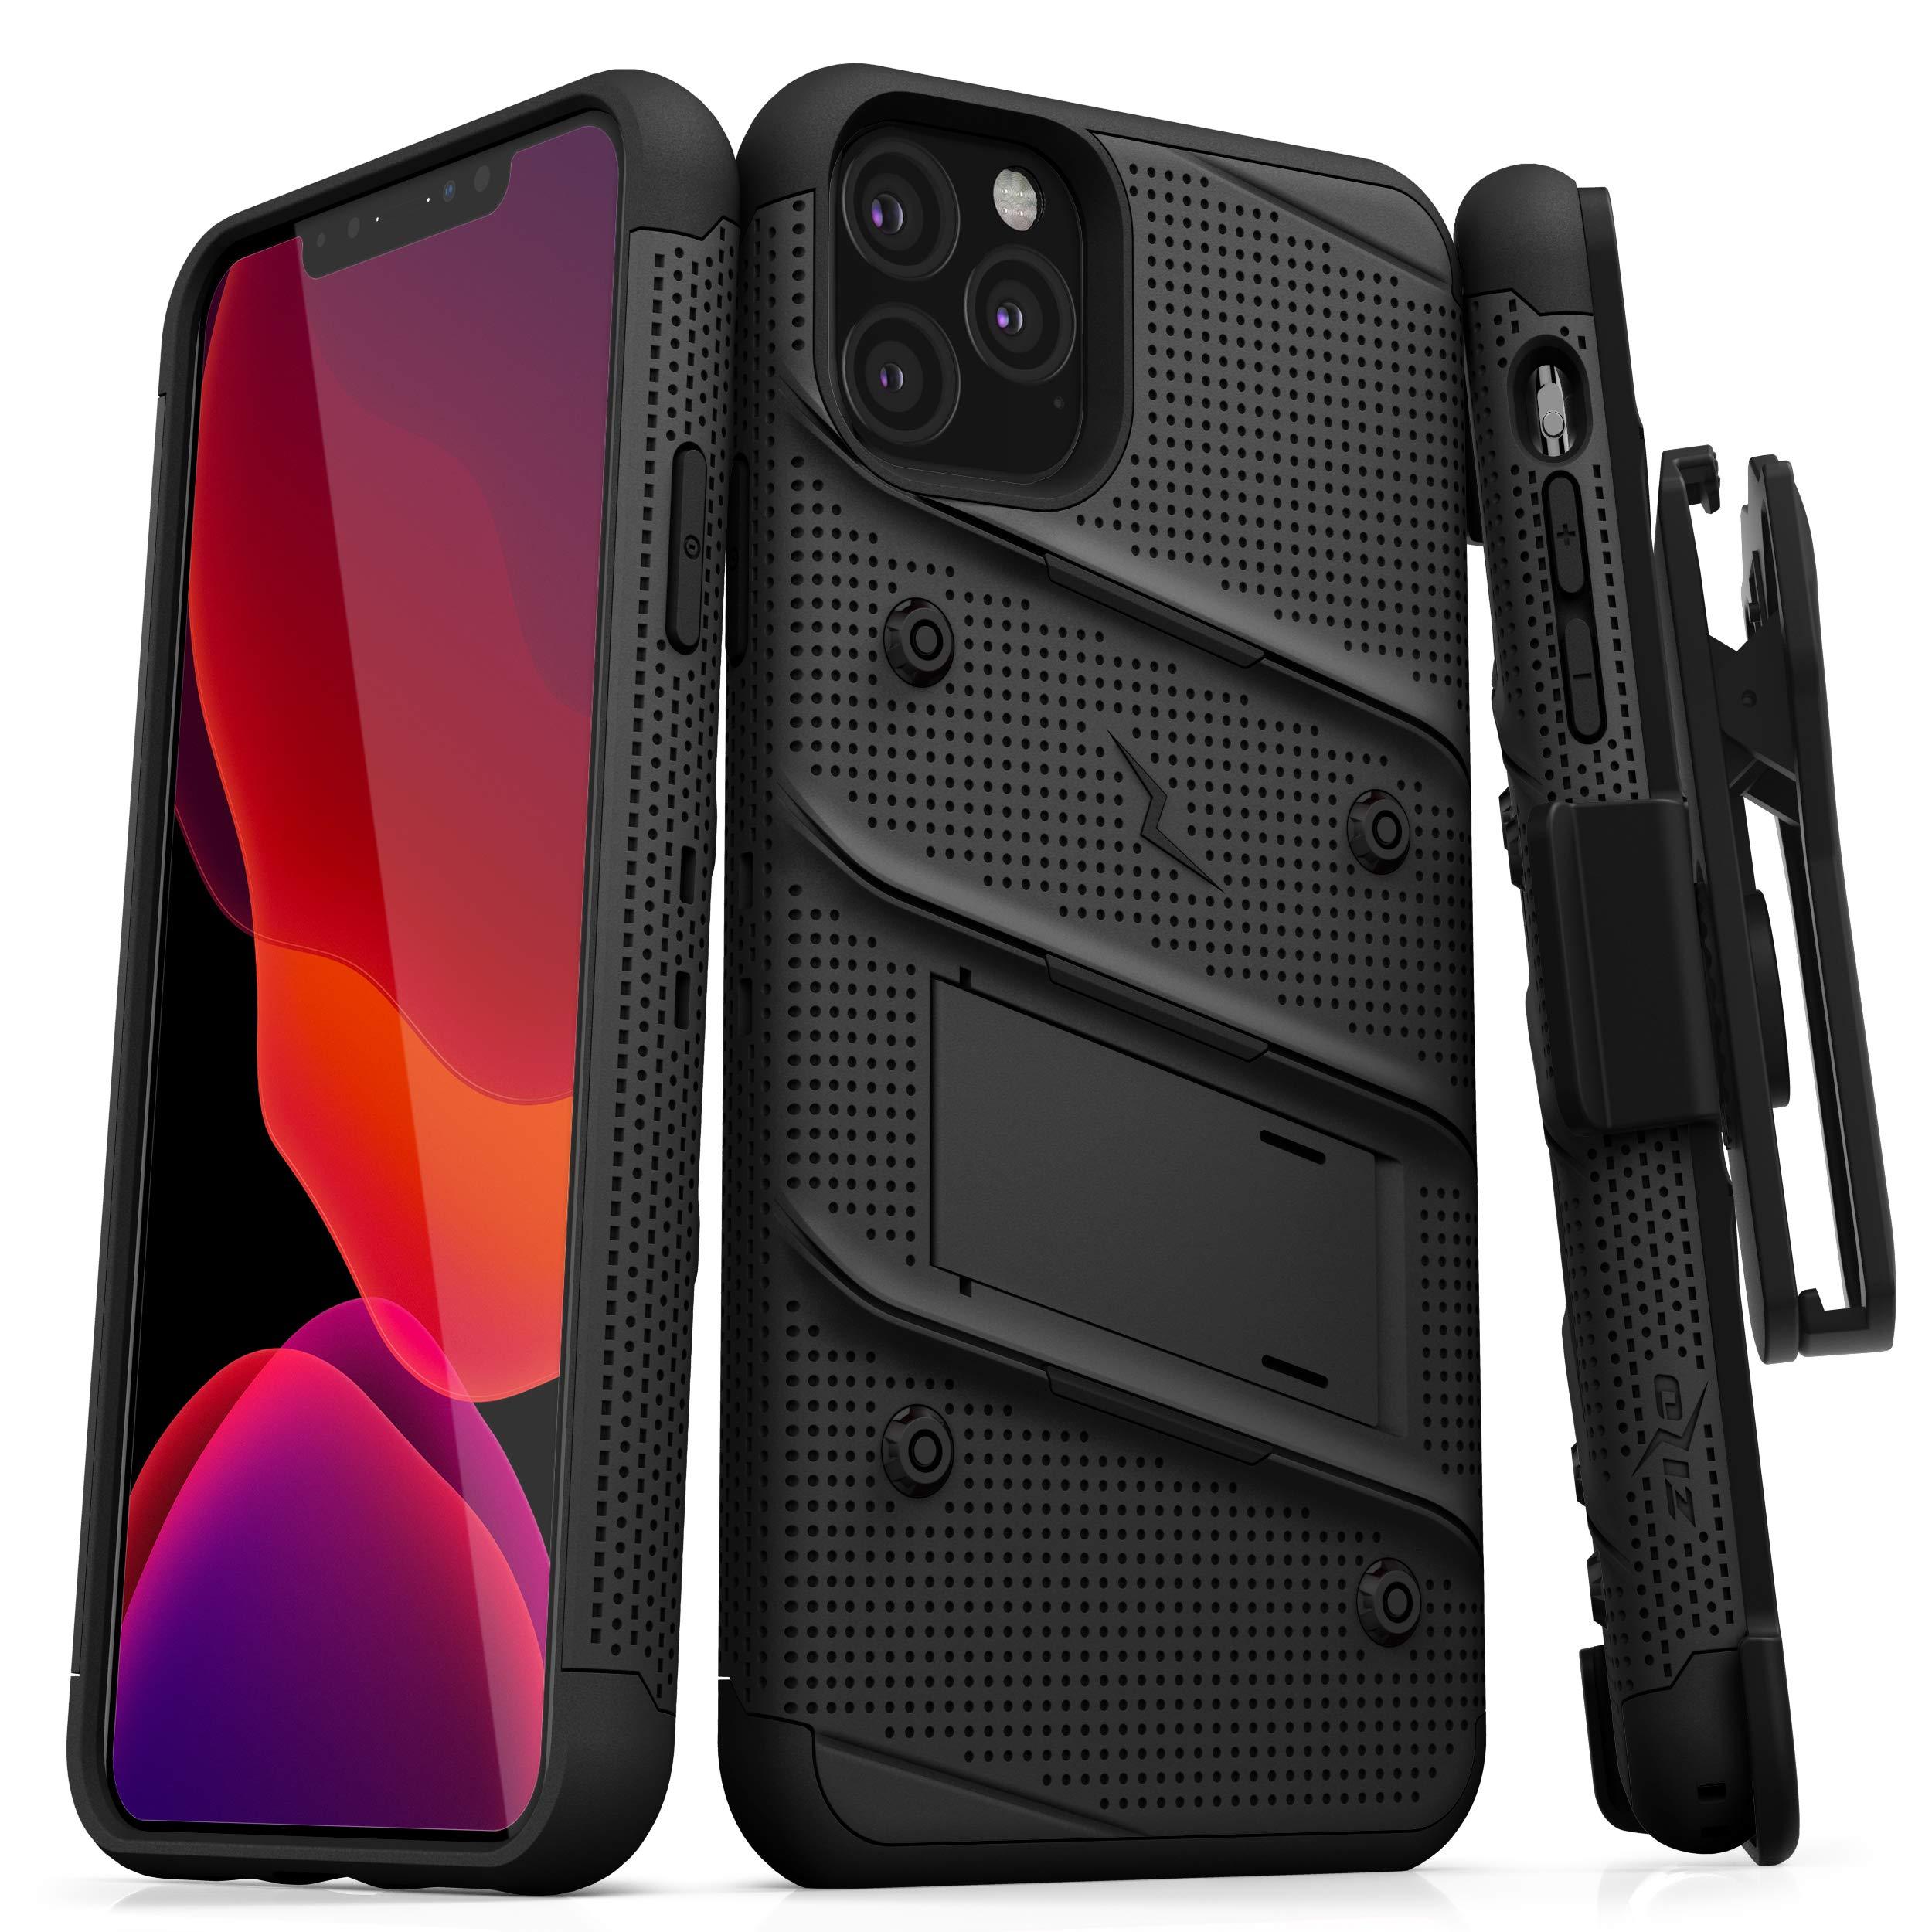 Funda + Vidrio Iphone 11 Pro Con Pie ZIZO [7X8SQST3]